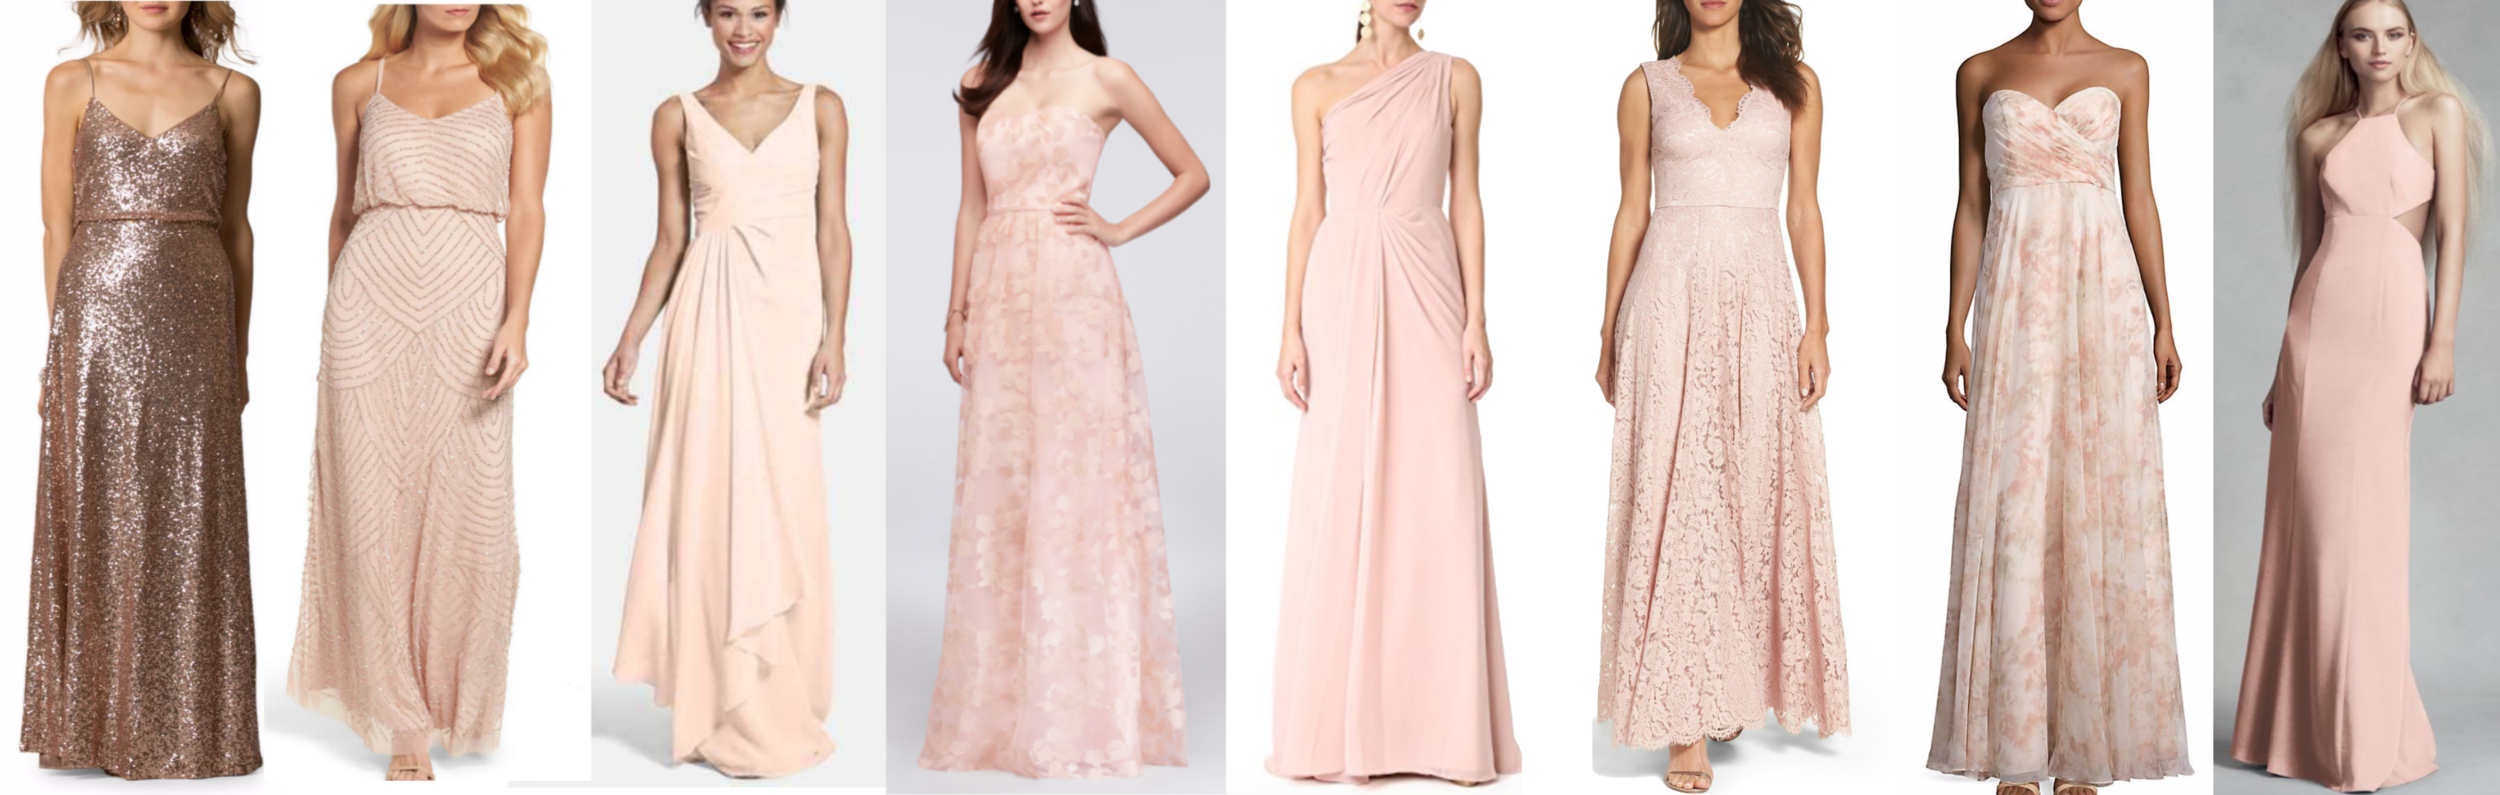 bridesmaids dresses collage